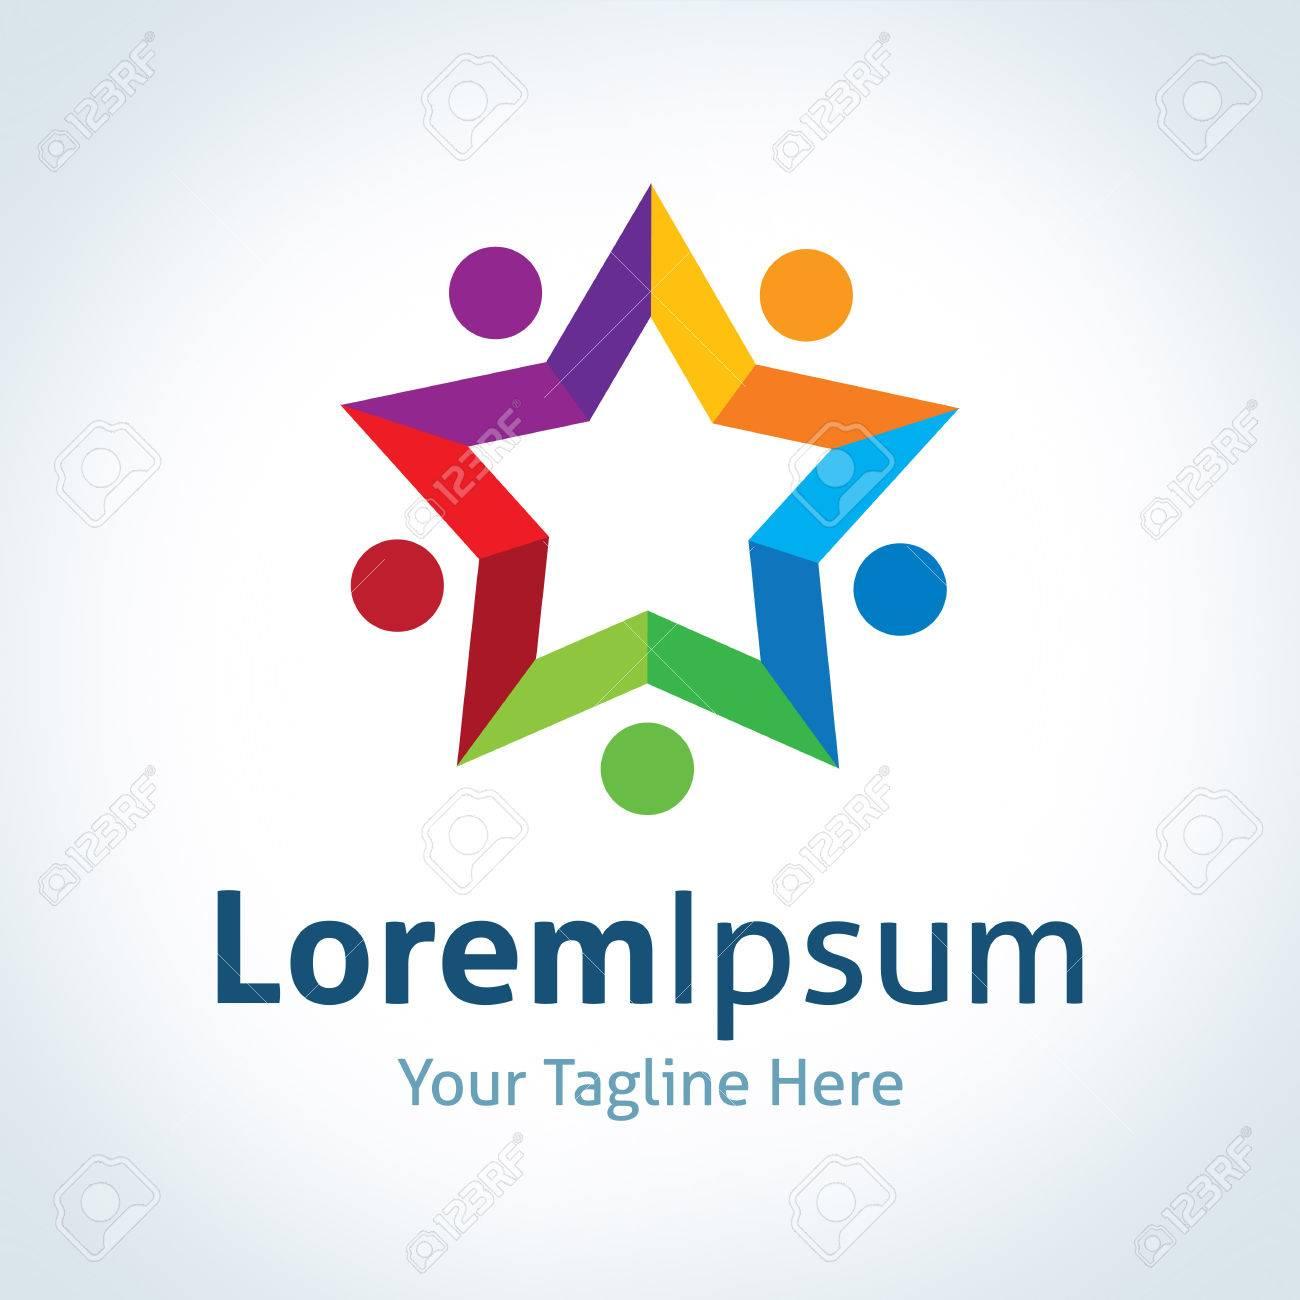 Asociación Forma De Estrella Logo Conexión Vectorial De Icono ...